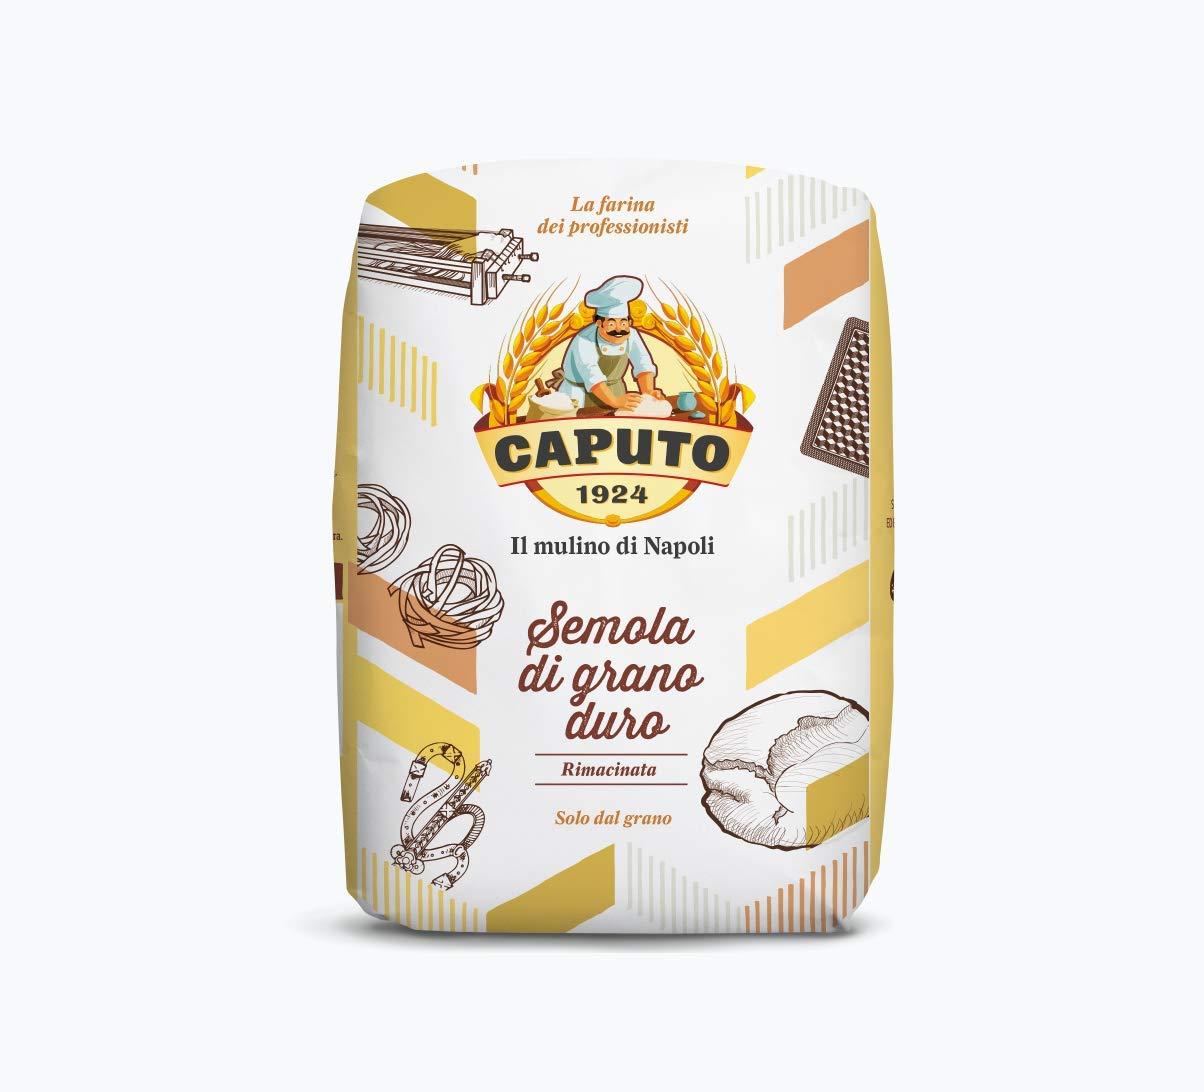 Antimo Caputo Semolina Flour 2.2 LB (Pack of 2) Bulk Italian Durum Semola Flour - All Natural Dough for Fresh Pasta